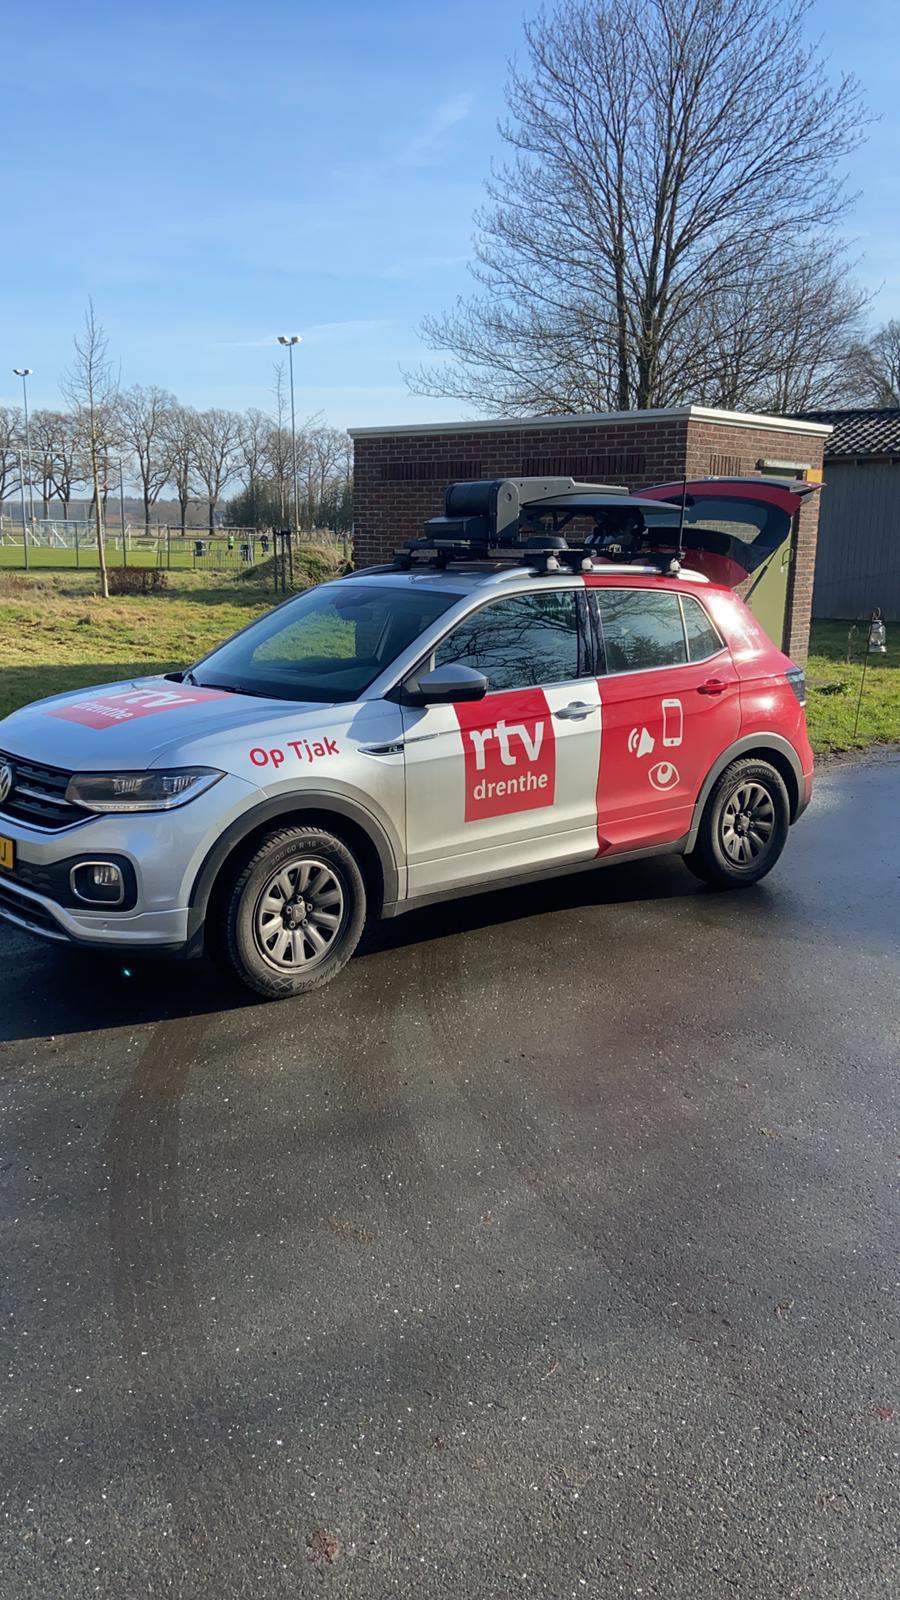 Hemmeltied RTV Drenthe uitzending gemist